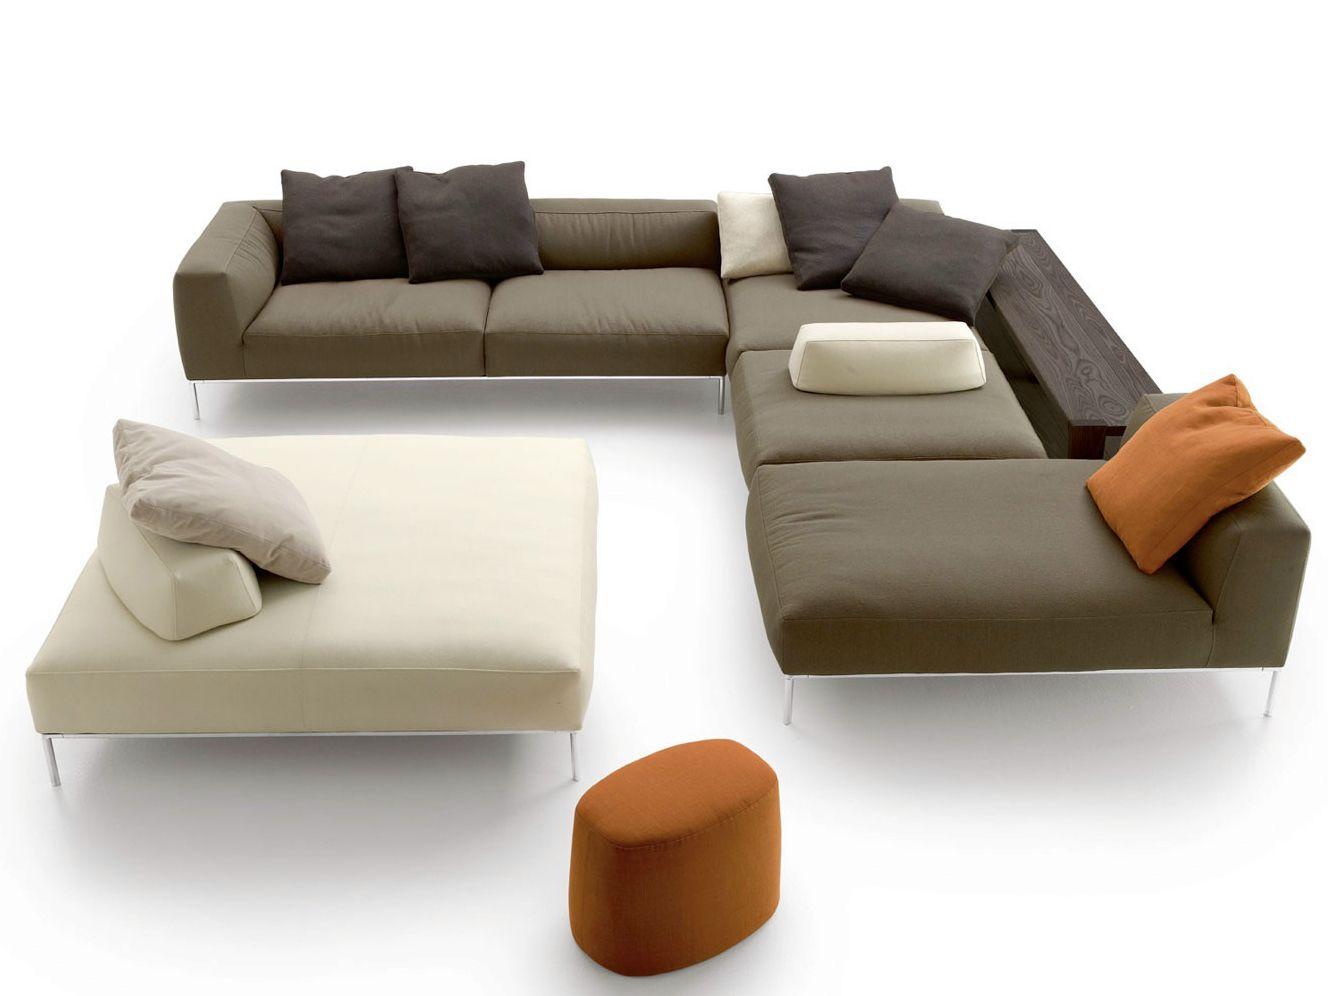 Divano Componibile Angolare - Home Design E Interior Ideas - Refoias.net